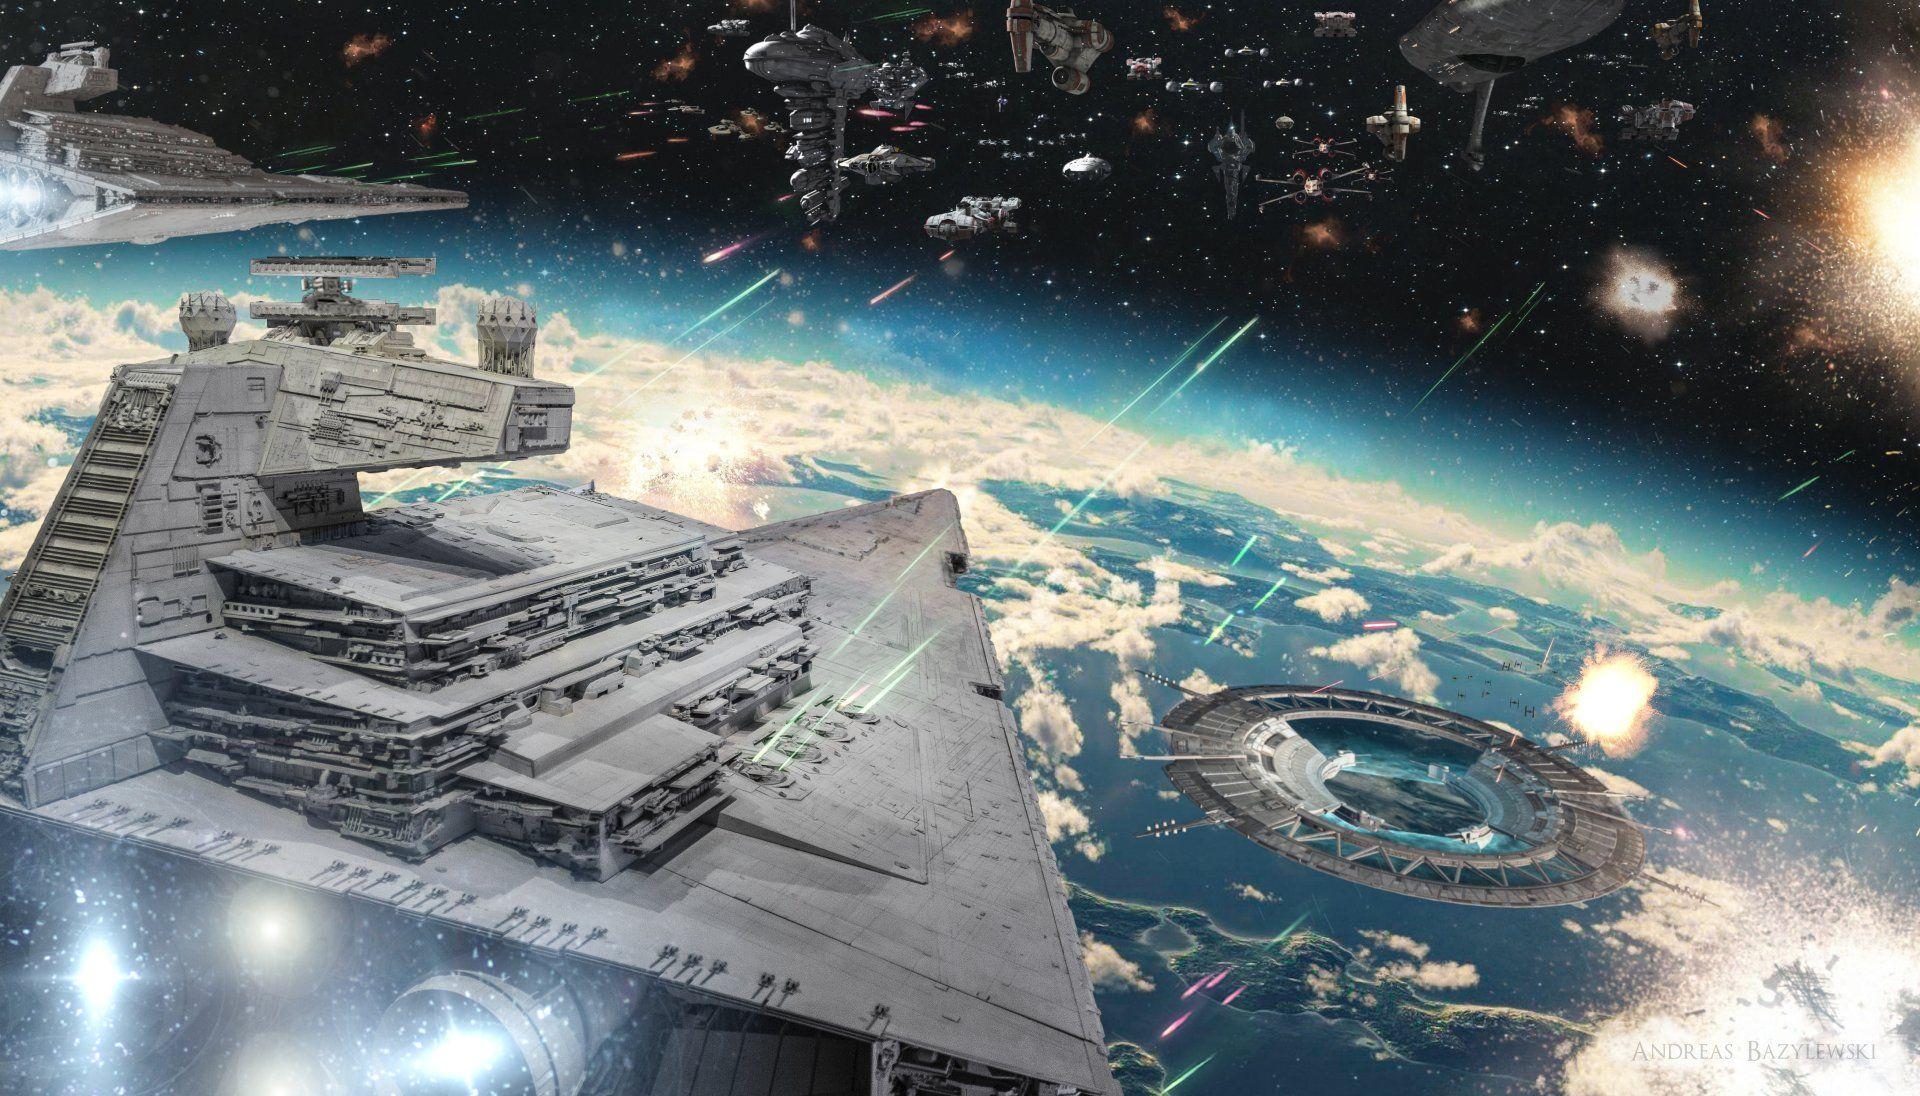 Pin On Star Wars Ships